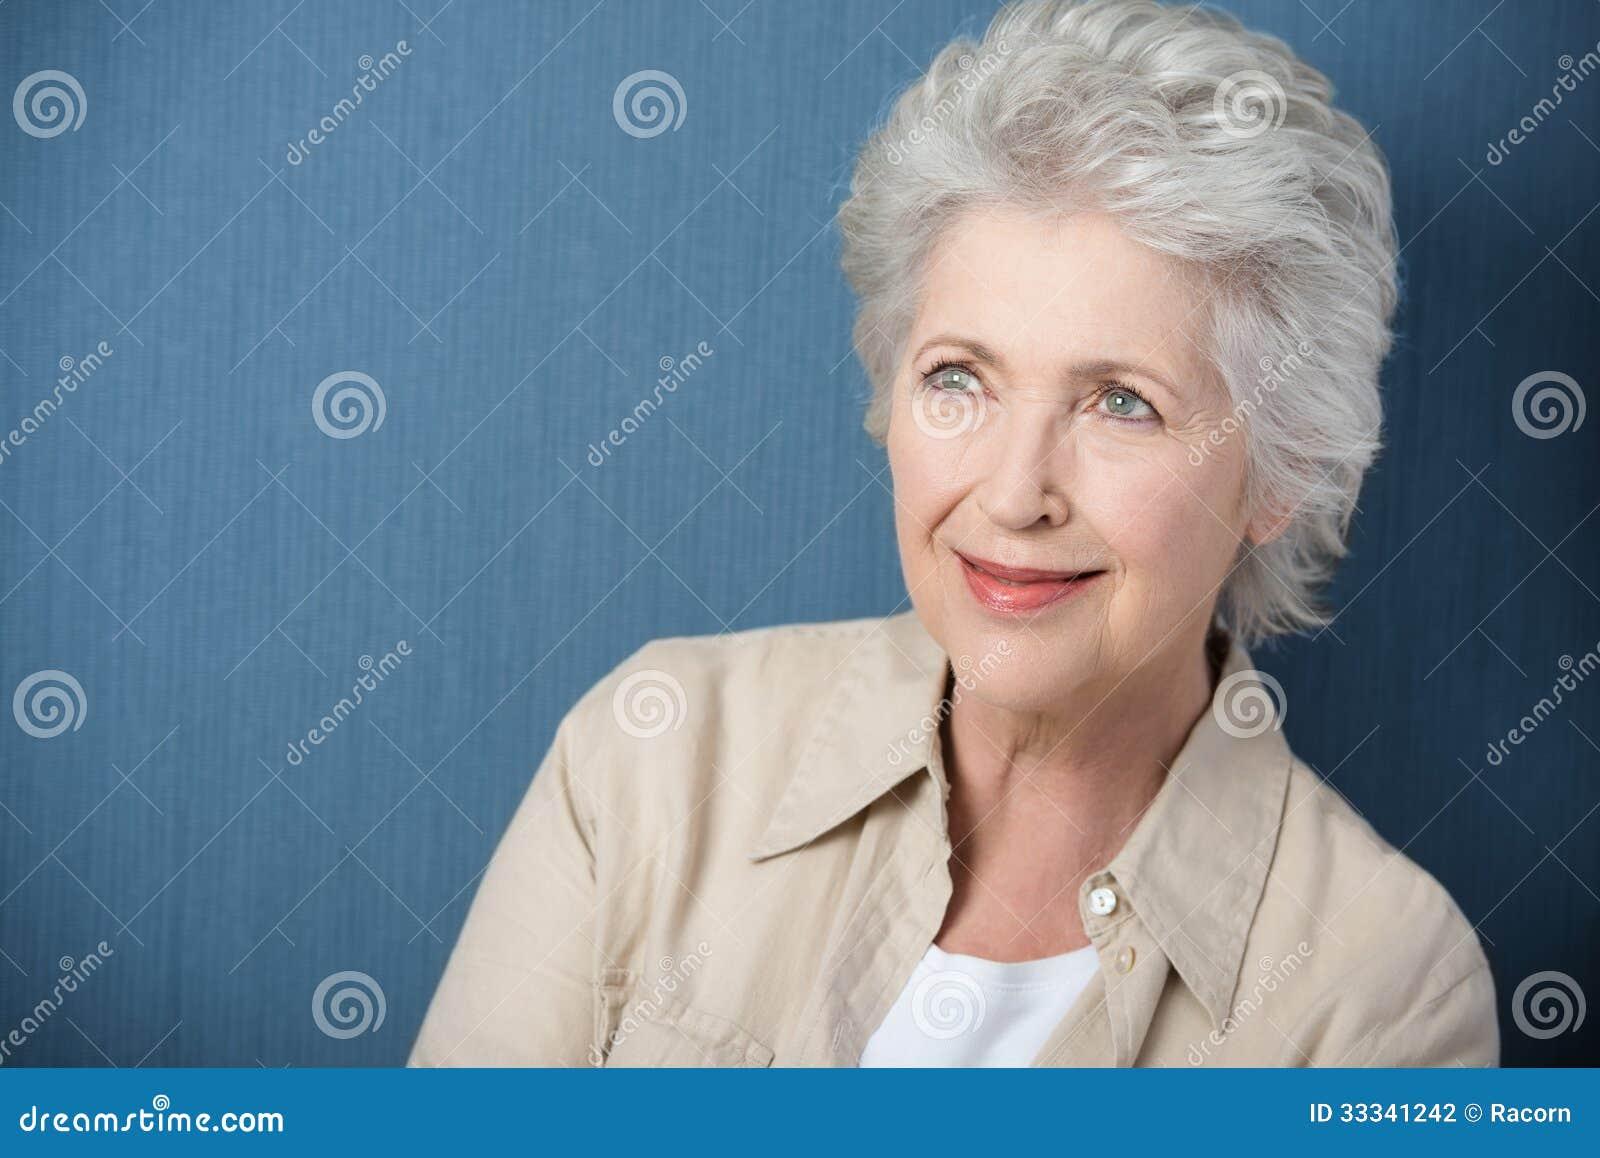 Beautiful senior woman daydreaming